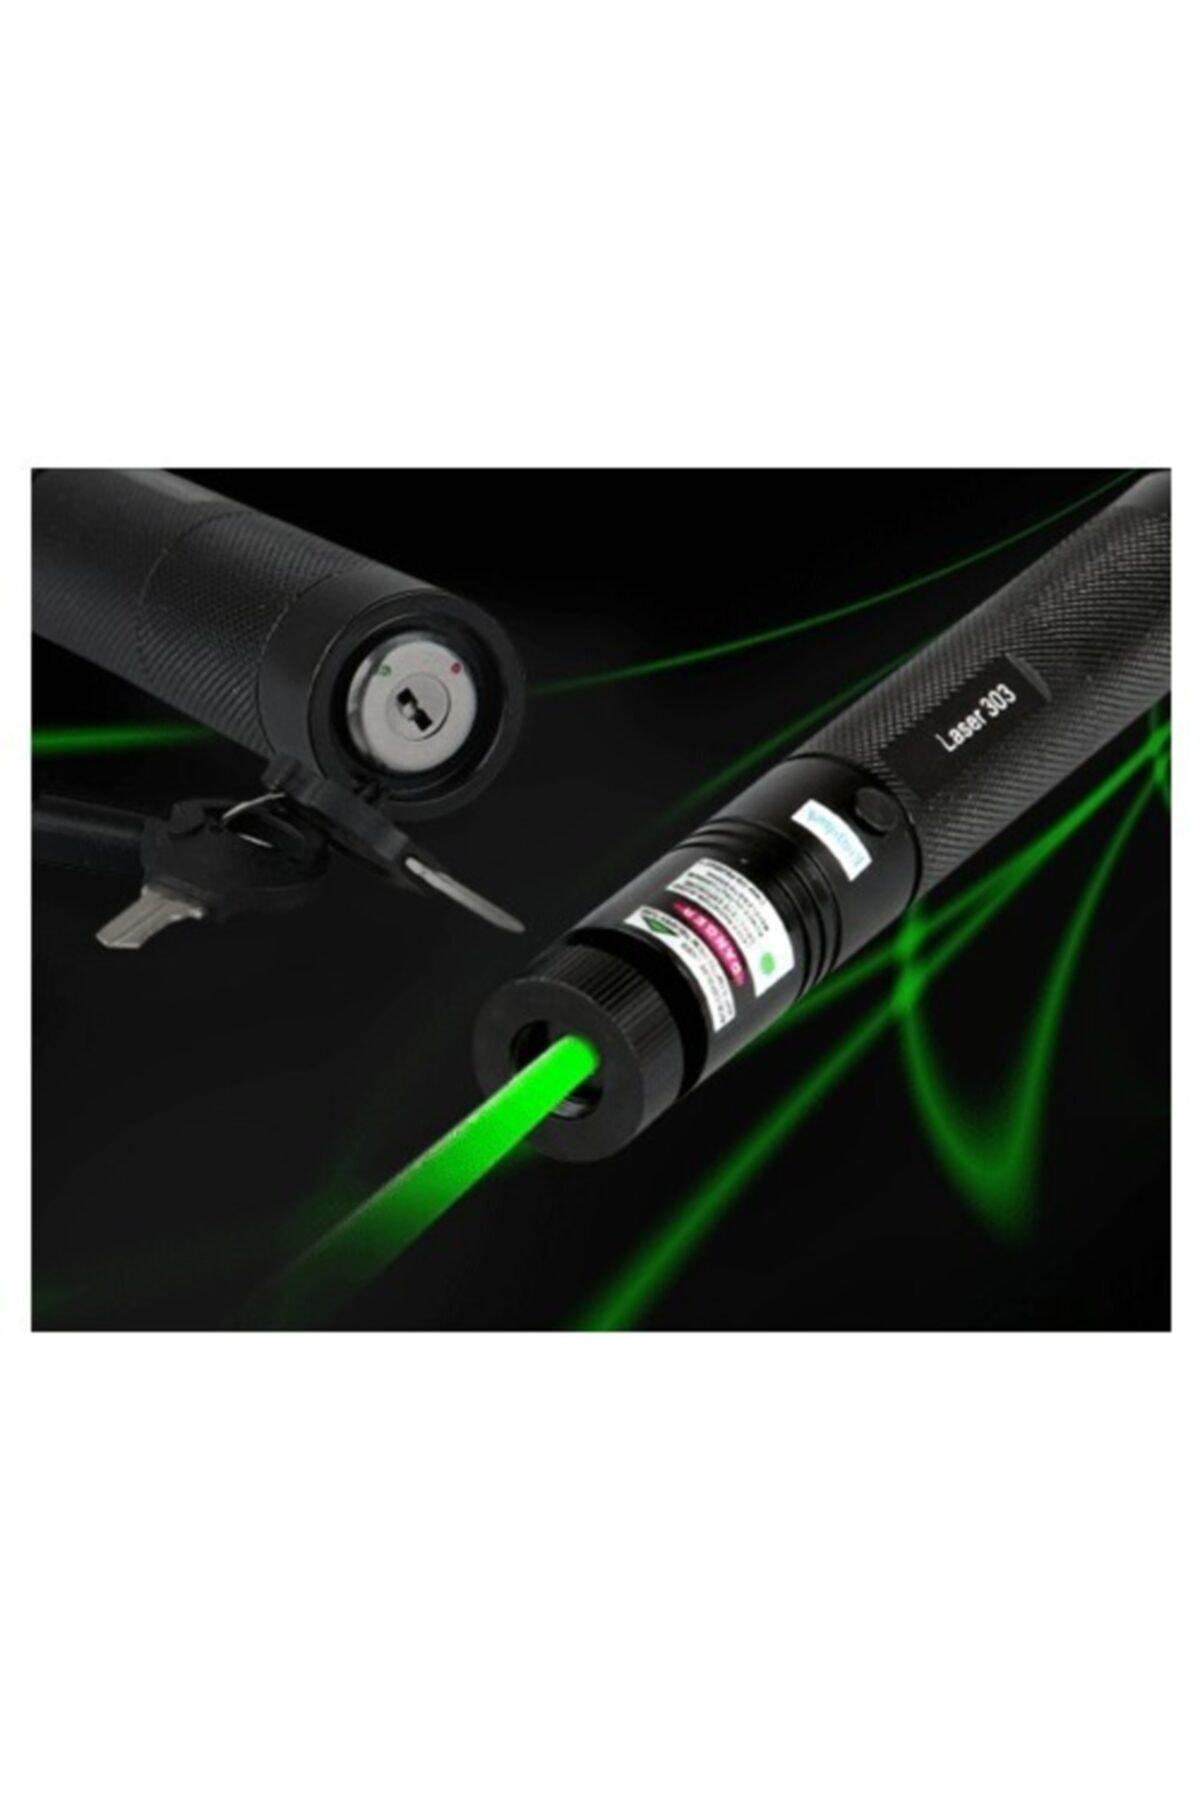 yopigo Turbo X Yeşil Şarjlı Lazer Pointer 5000 mw 1